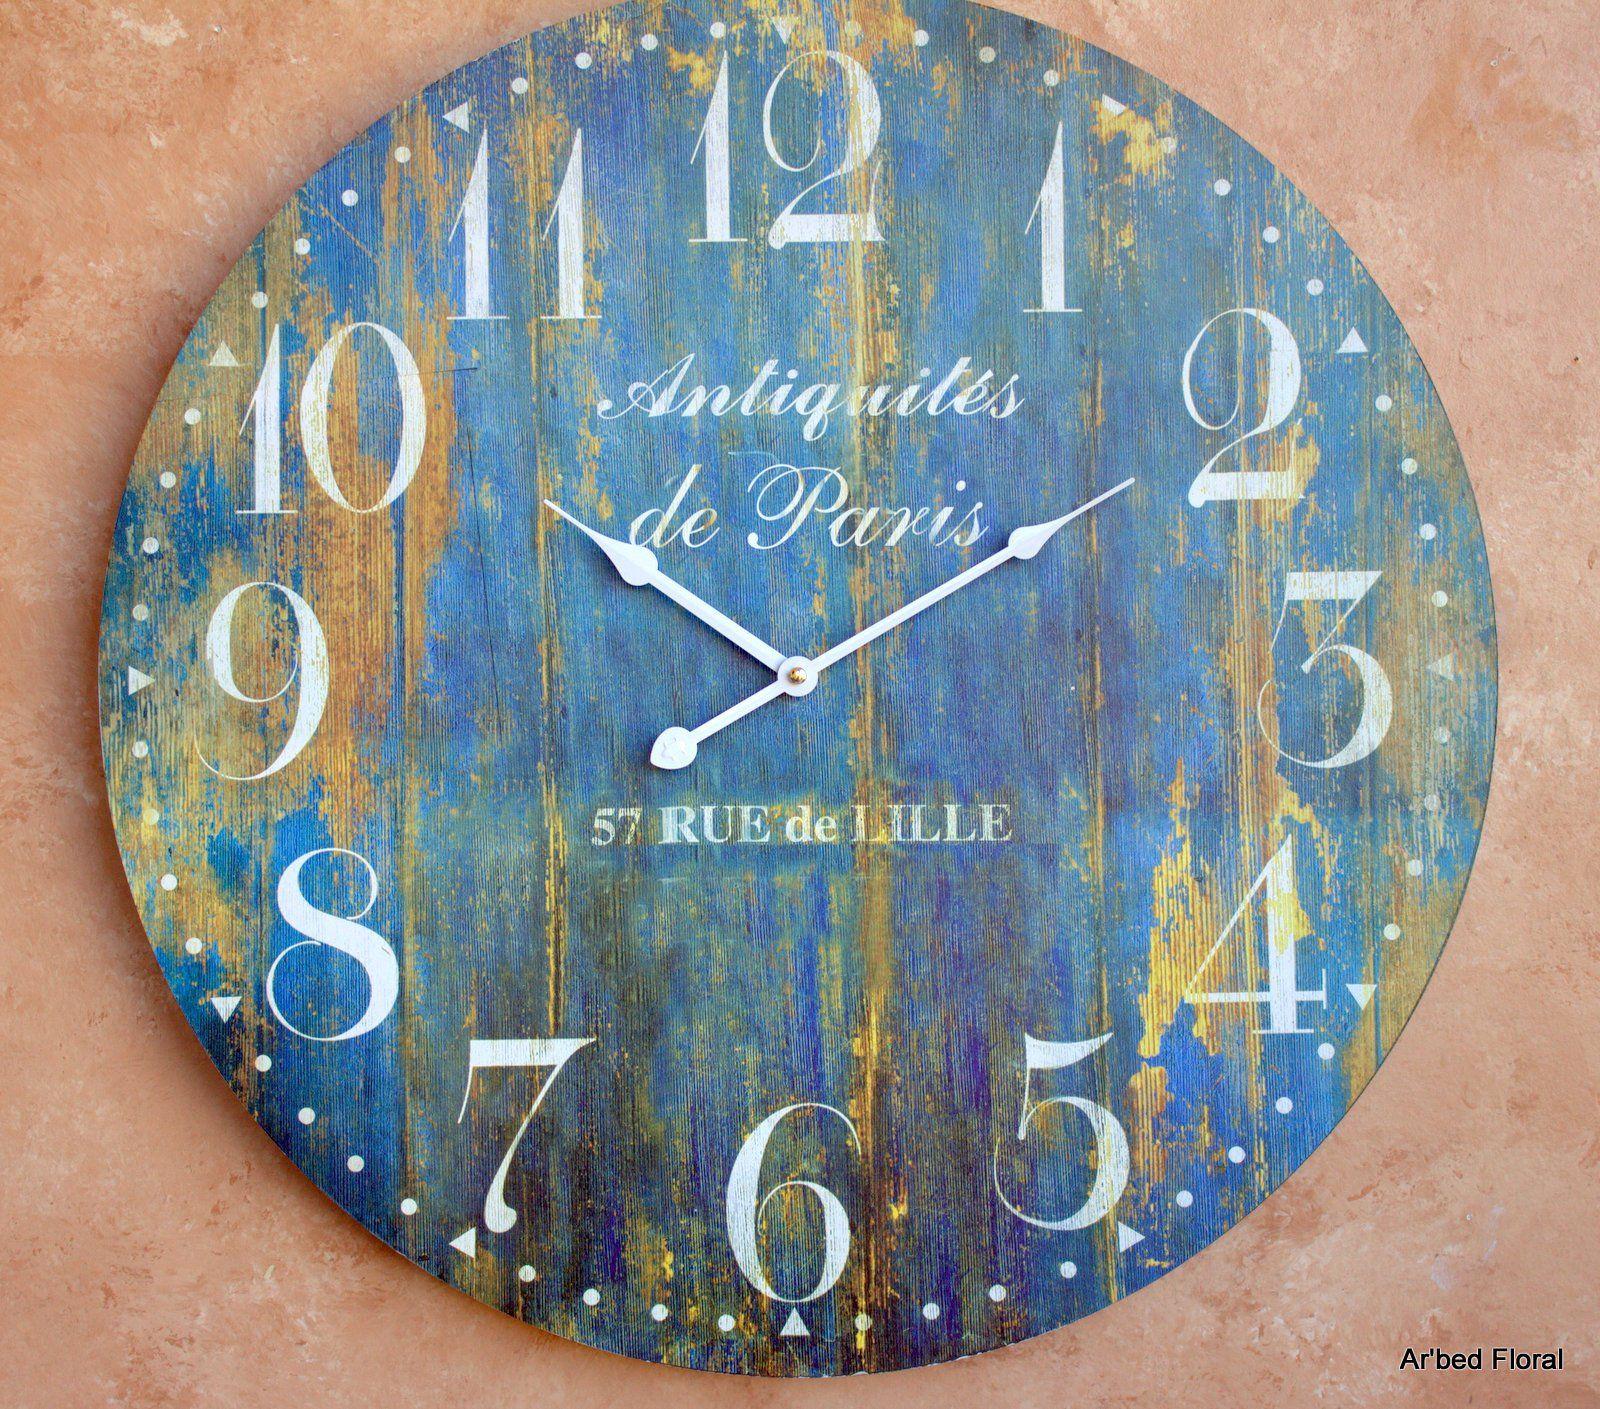 Amazon Com 23 Large Antiquites De Paris Wall Clock French Blue Finish Grand Central Station Wall Wall Clock Wooden Farmhouse Wall Clocks Clock Wall Art